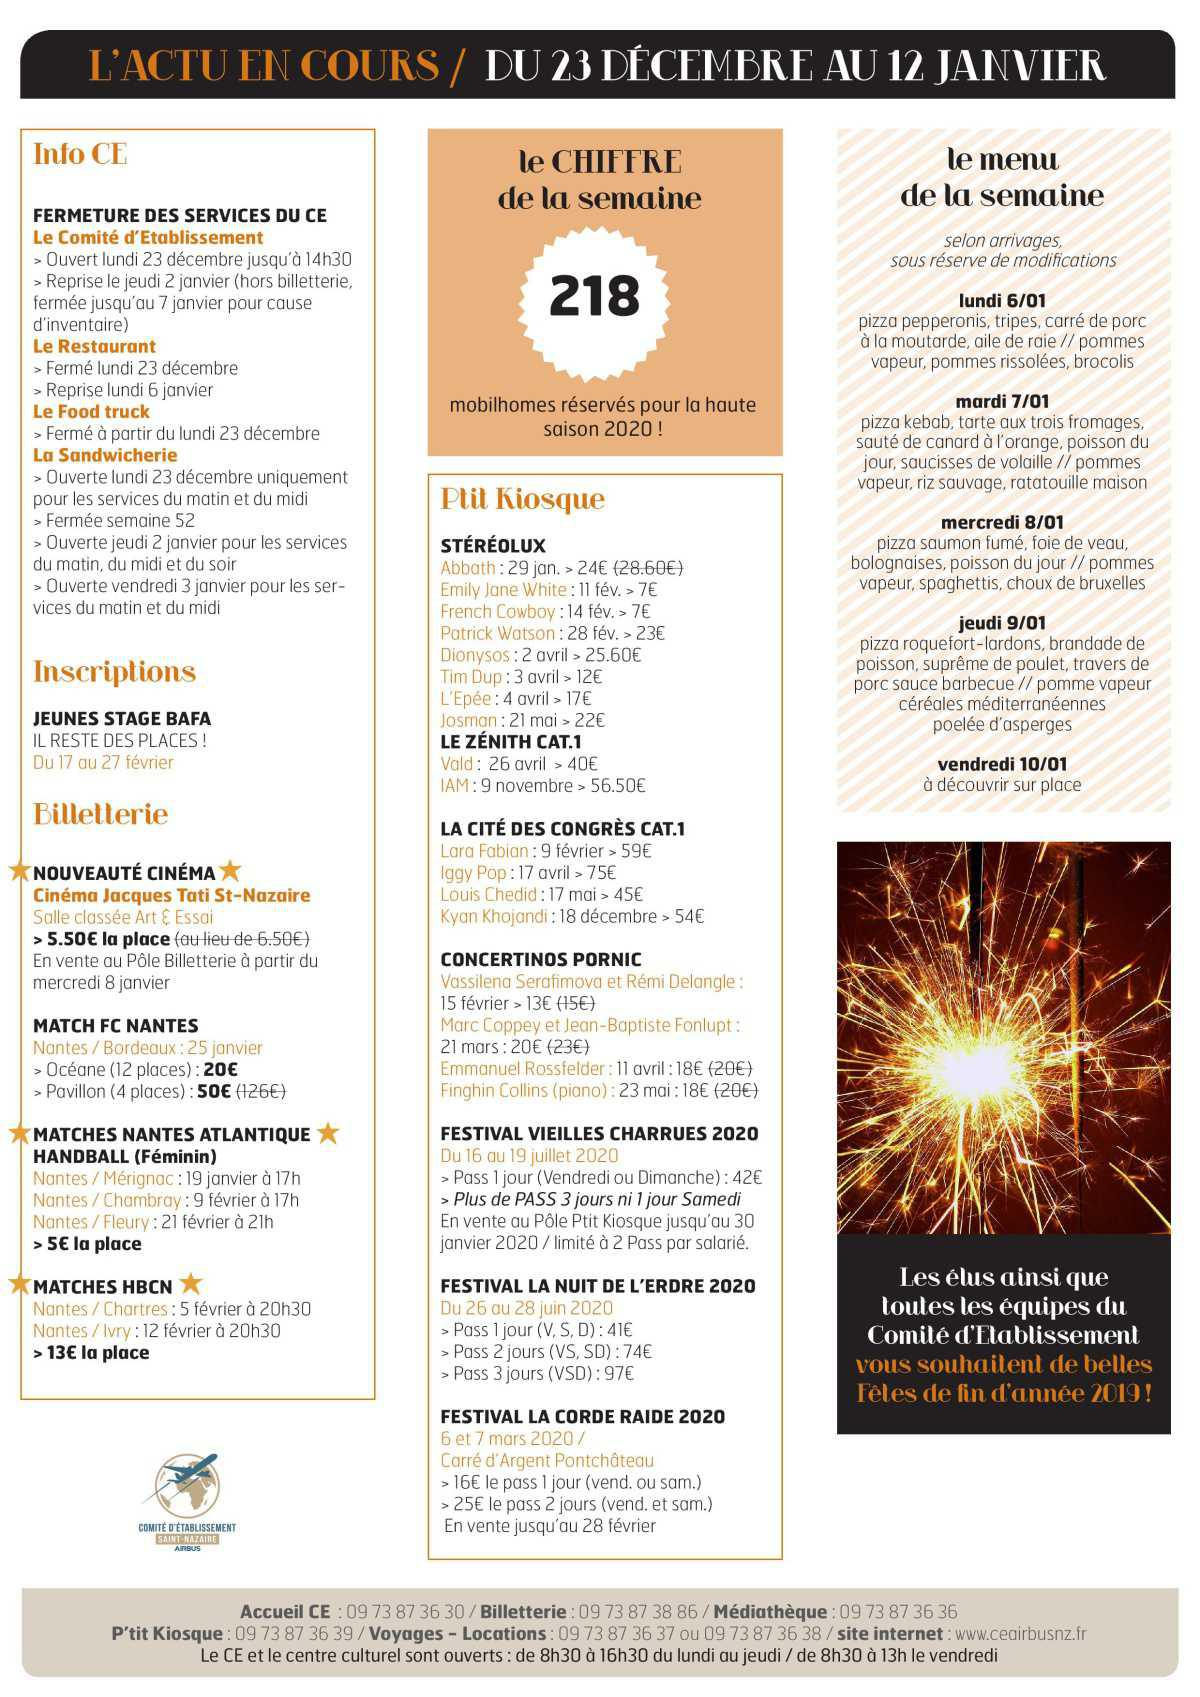 Infos CE/COOP Semaine 52